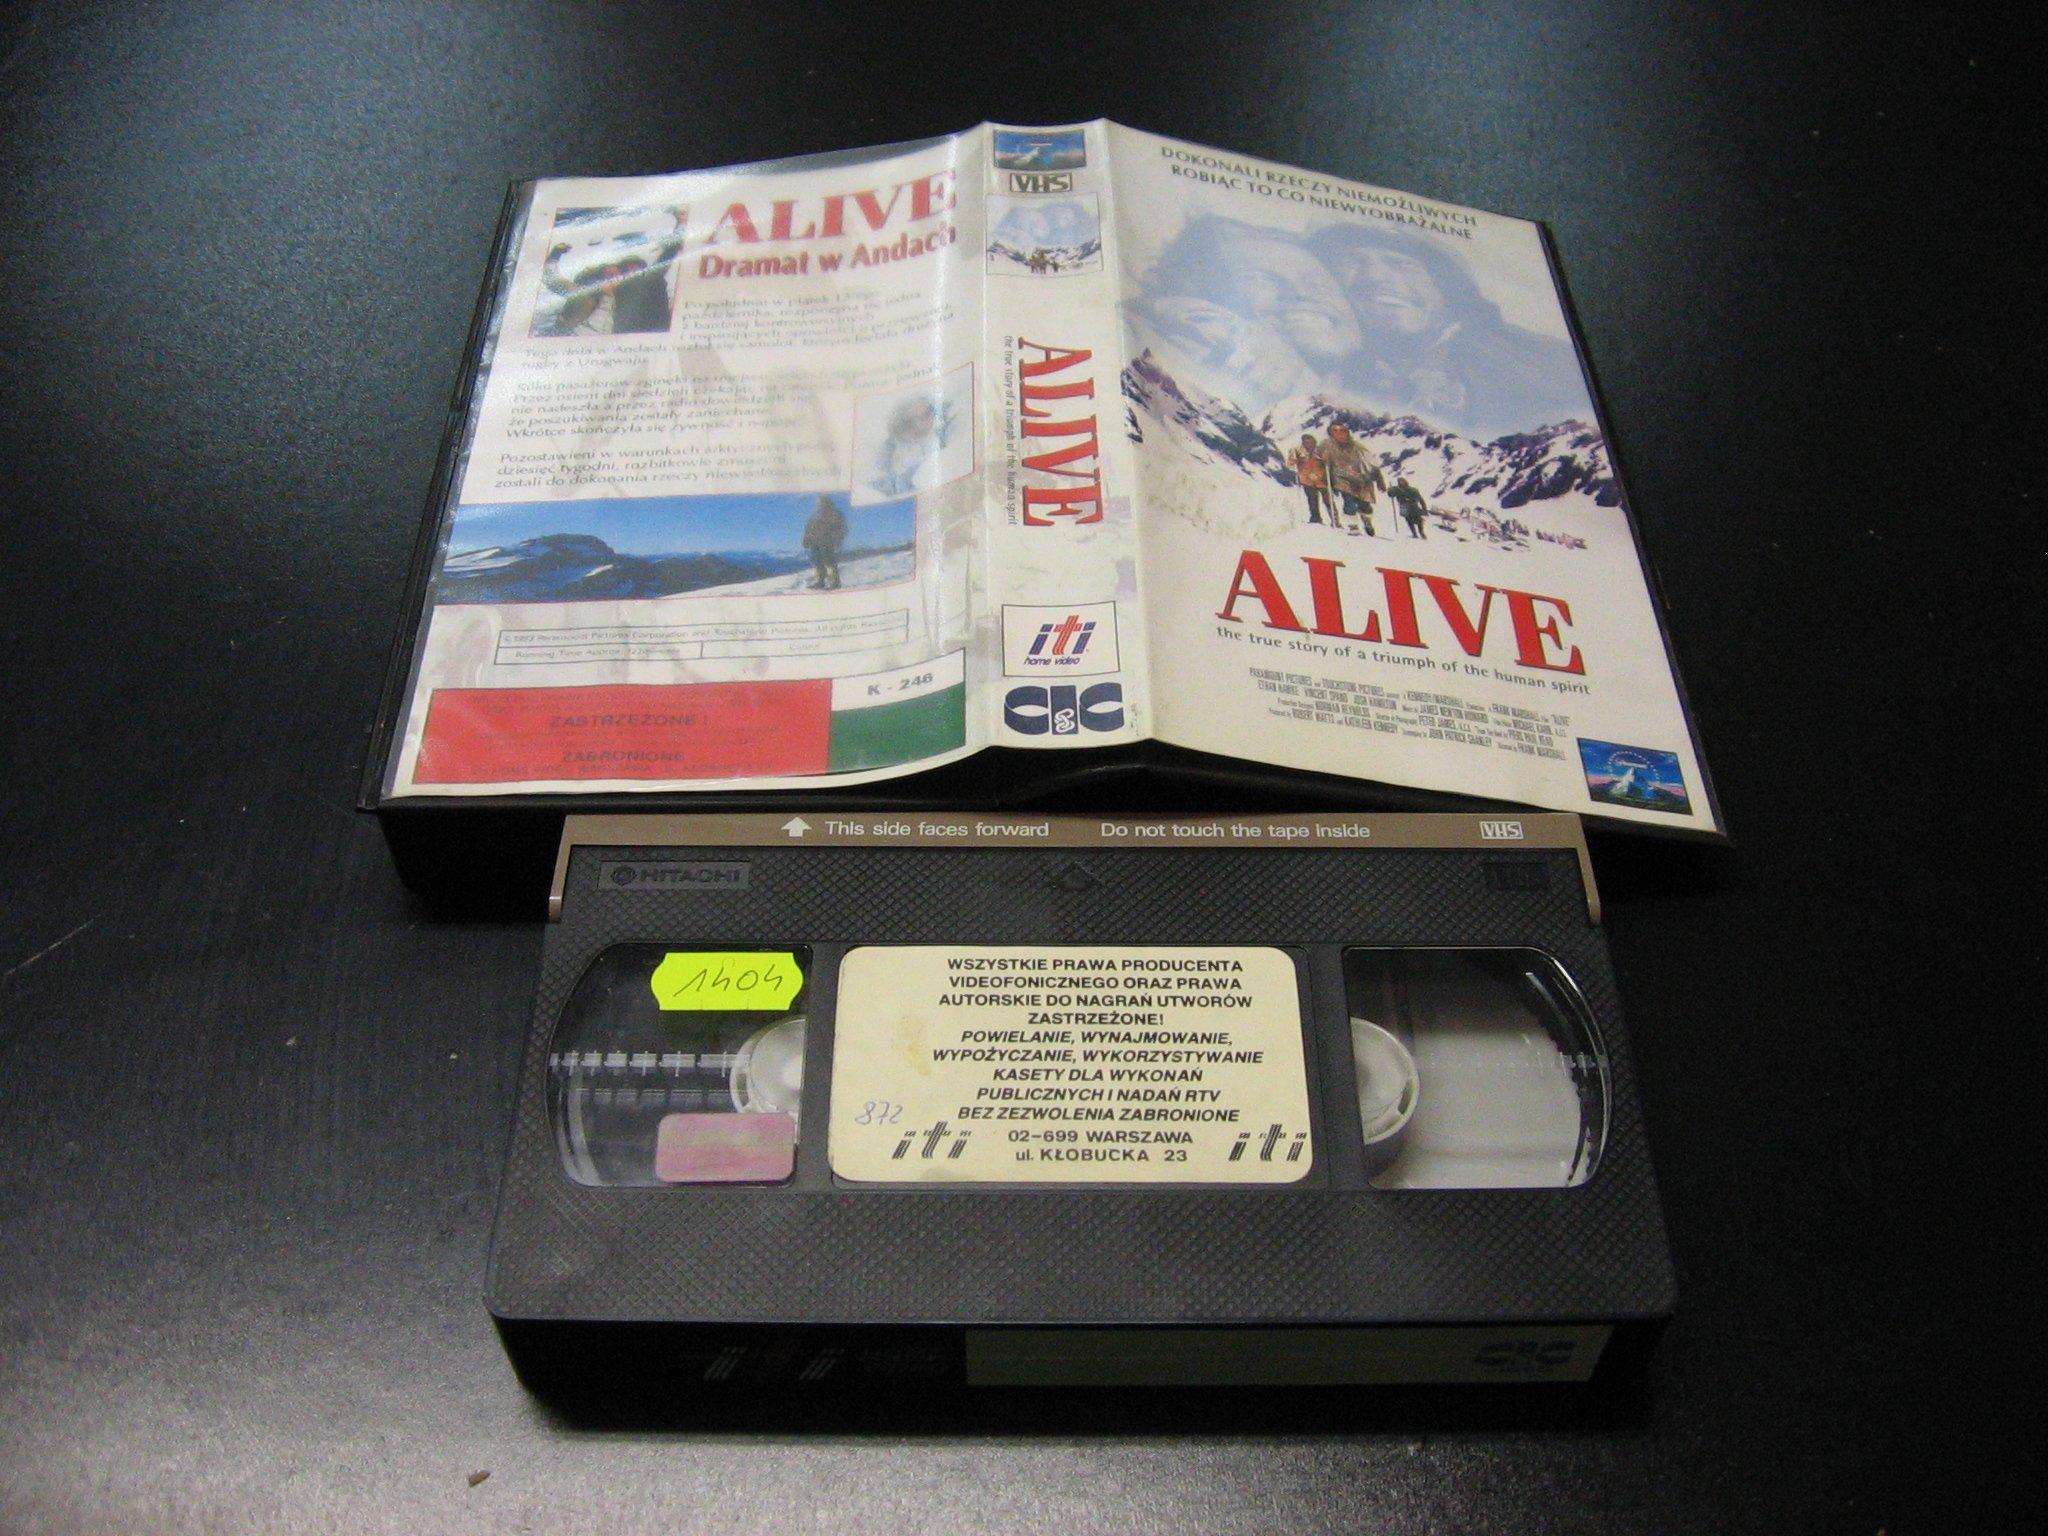 ALIVE - DRAMAT W ANDACH -  kaseta VHS - 1062 Opole - AlleOpole.pl